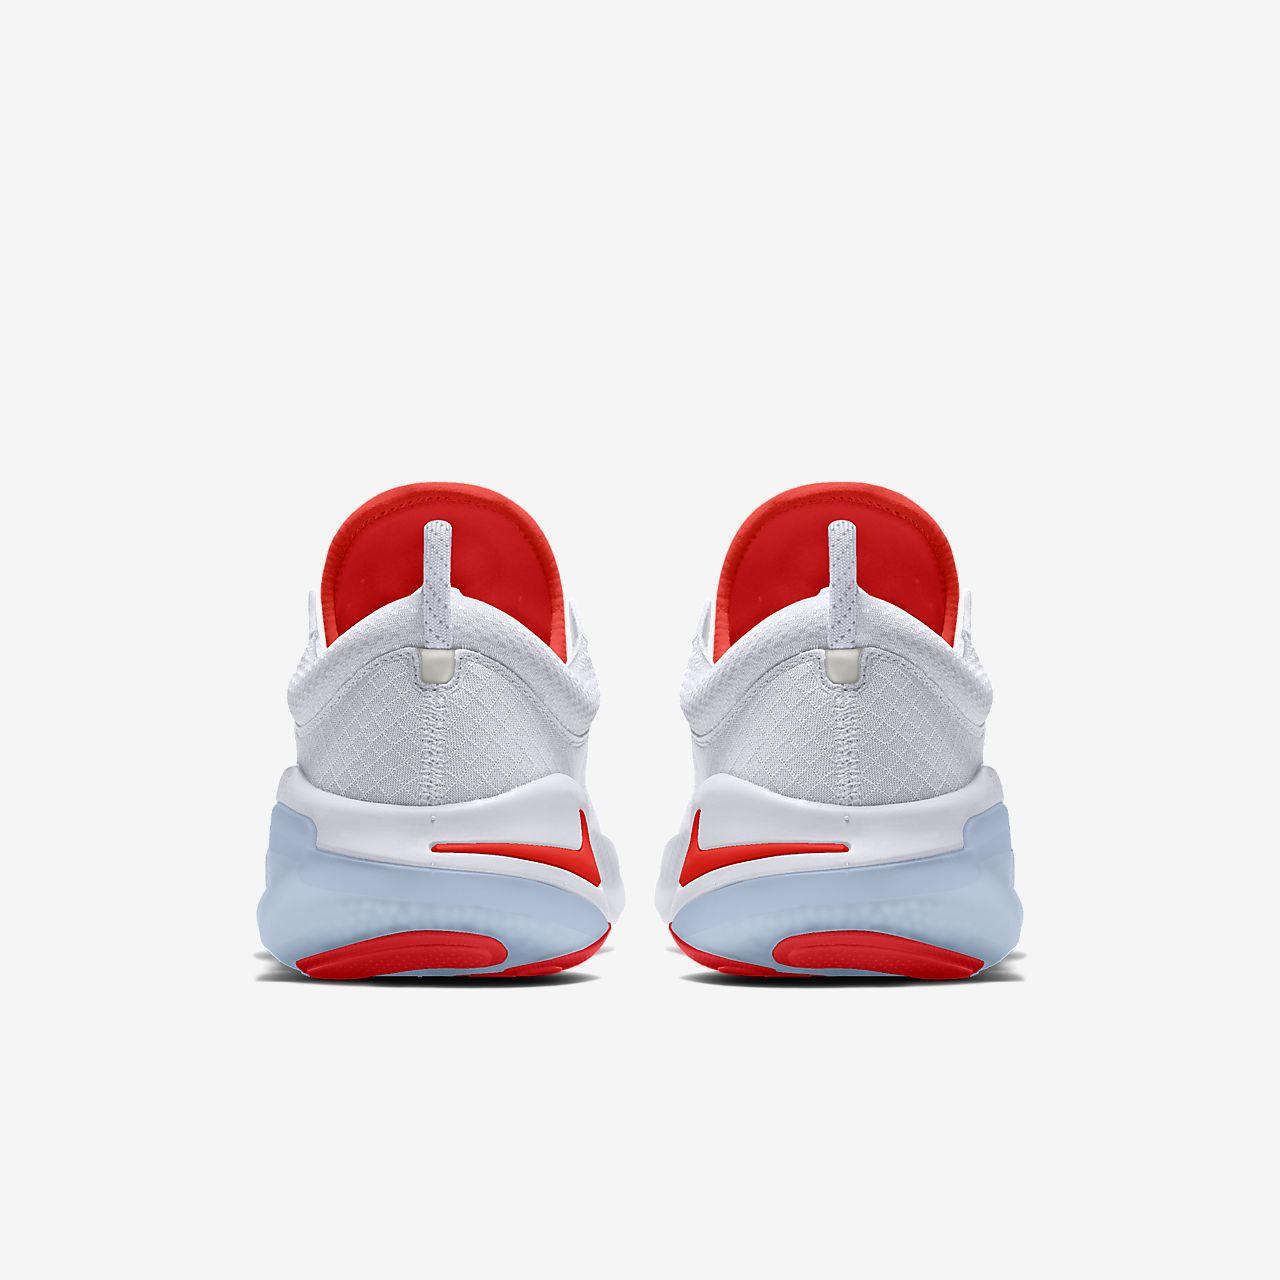 Nike Huarache Custom PinkBright CrimsonWhite Shoes Women